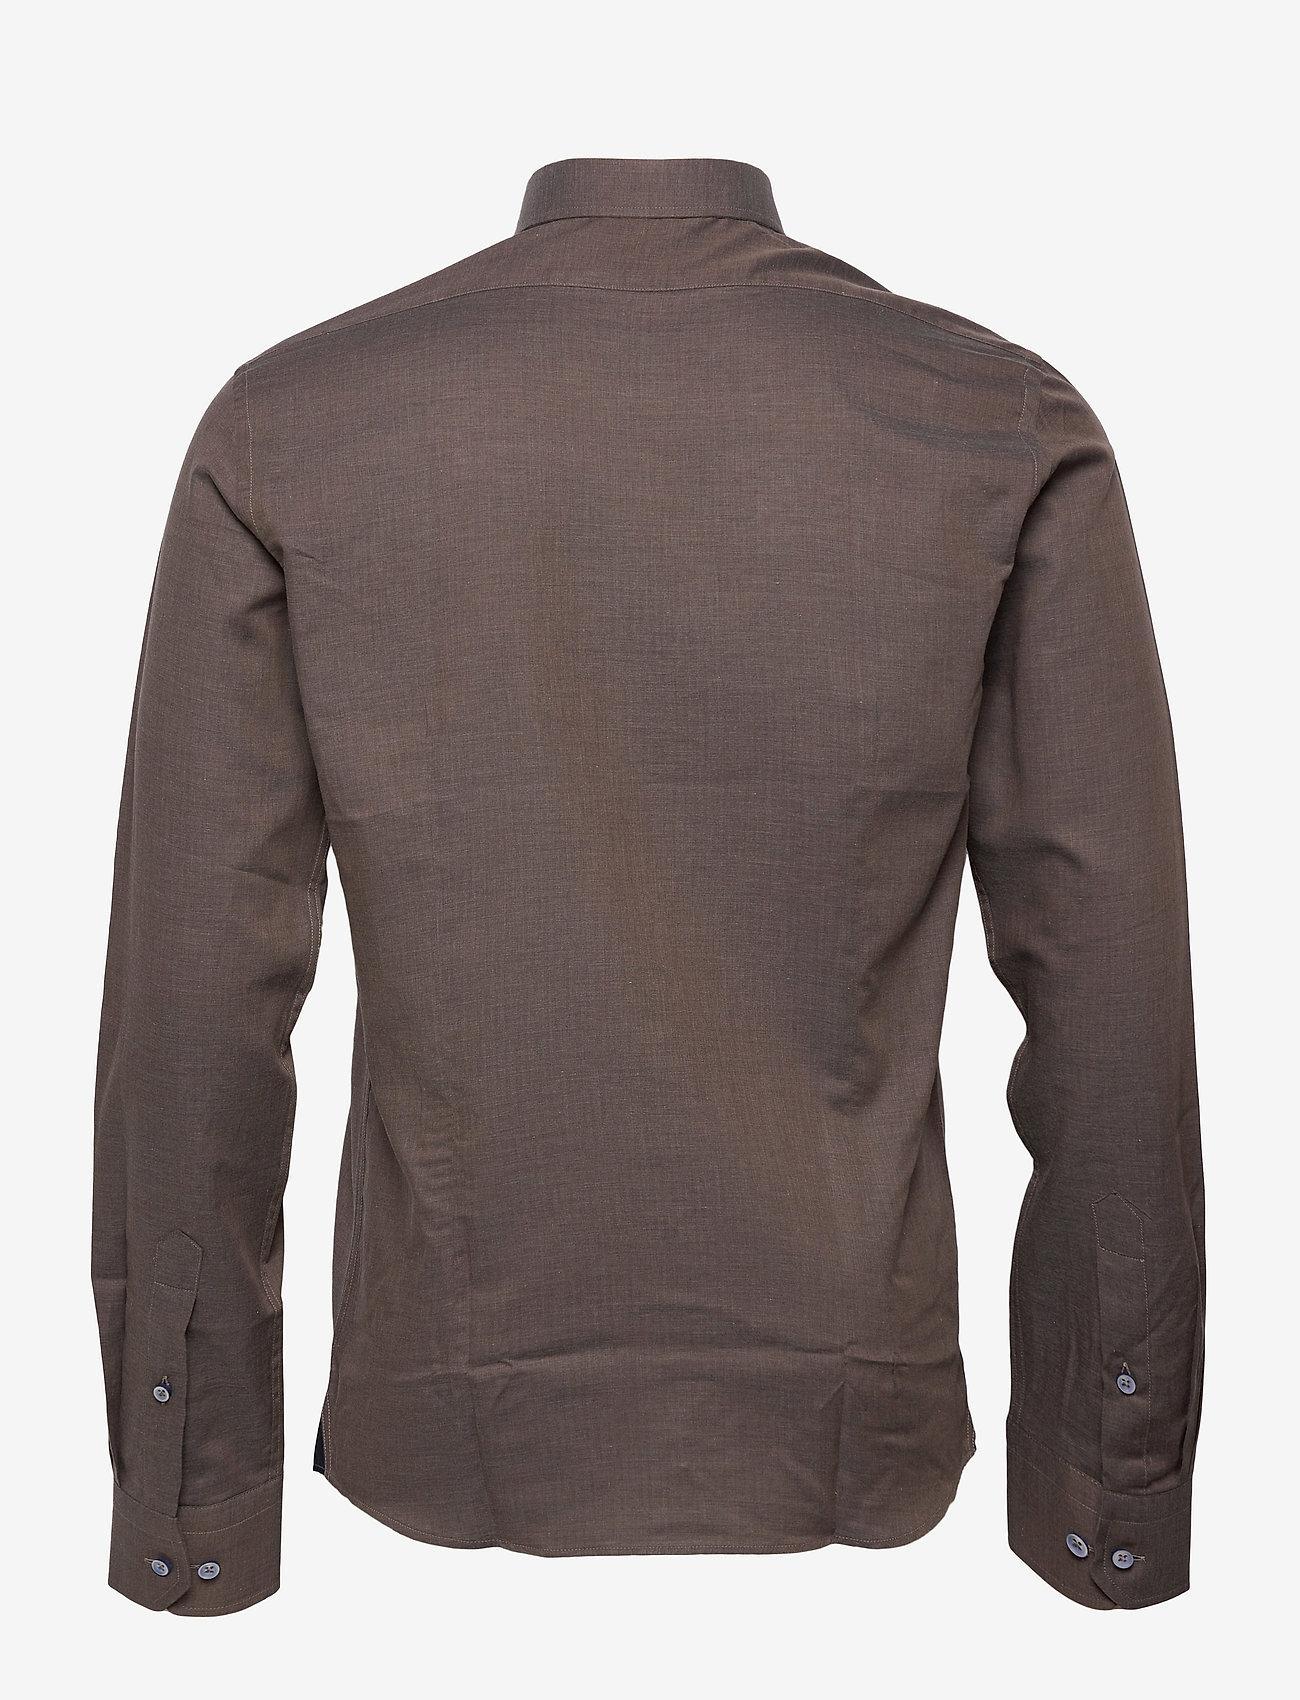 XO Shirtmaker by Sand Copenhagen - 8859 X - Jake SC - basic skjortor - dark brown - 1